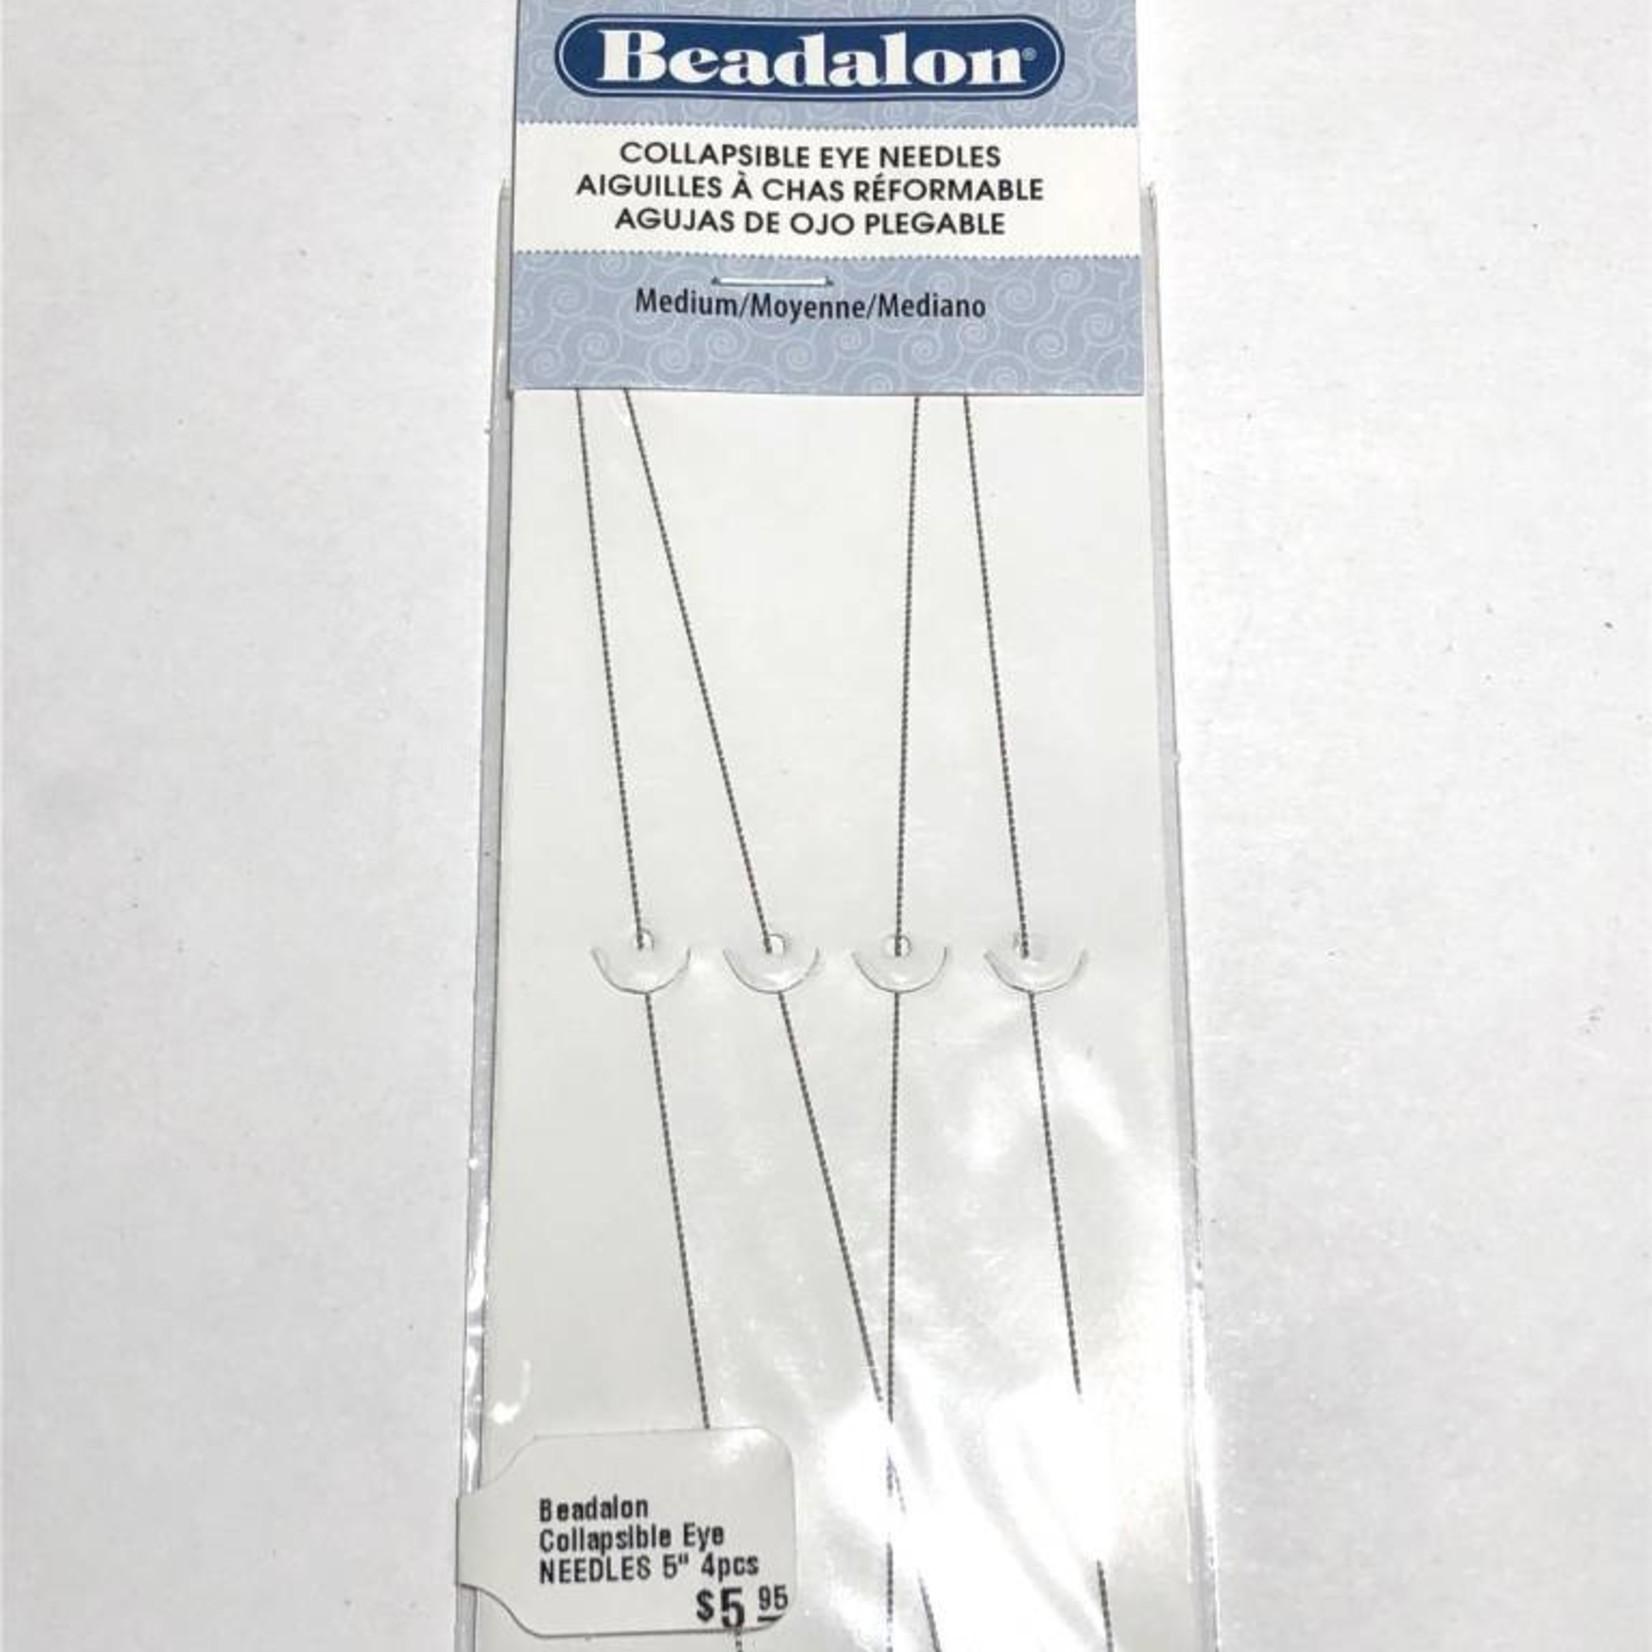 "Beadalon Collapsible Eye NEEDLES 5"" 4pcs"